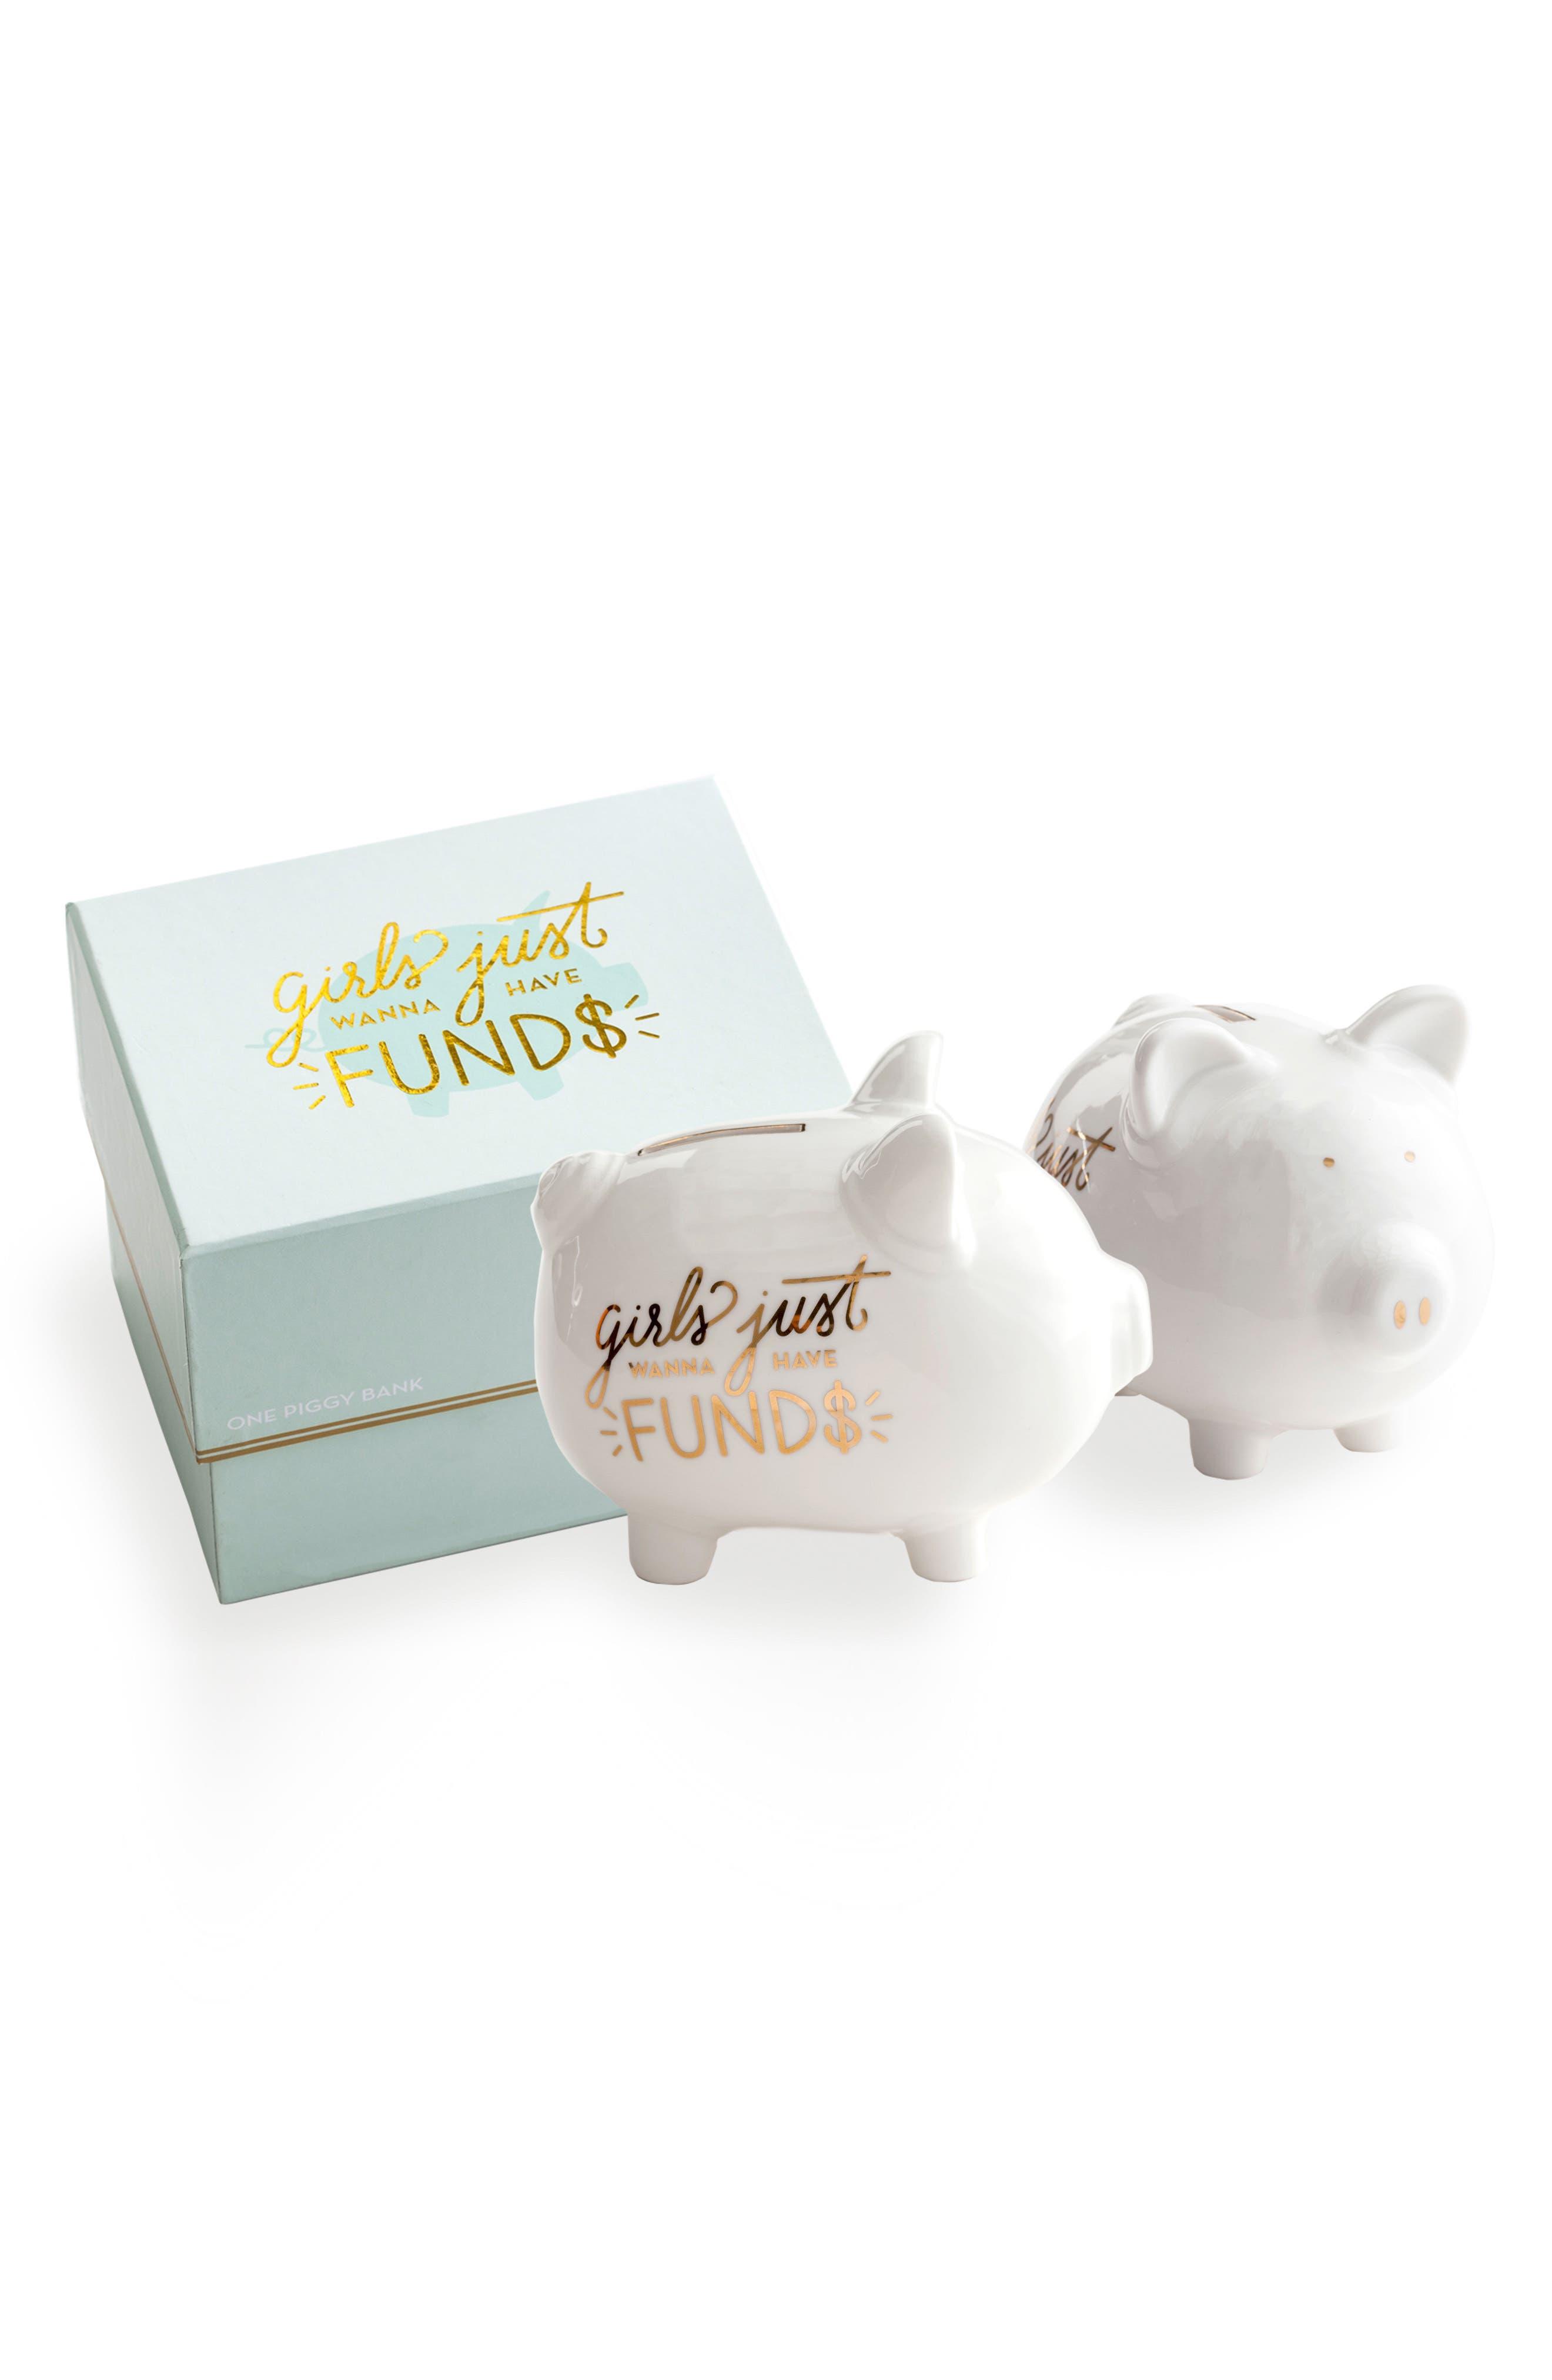 Main Image - Rosanna Girls Just Wanna Have Funds Porcelain Piggy Bank